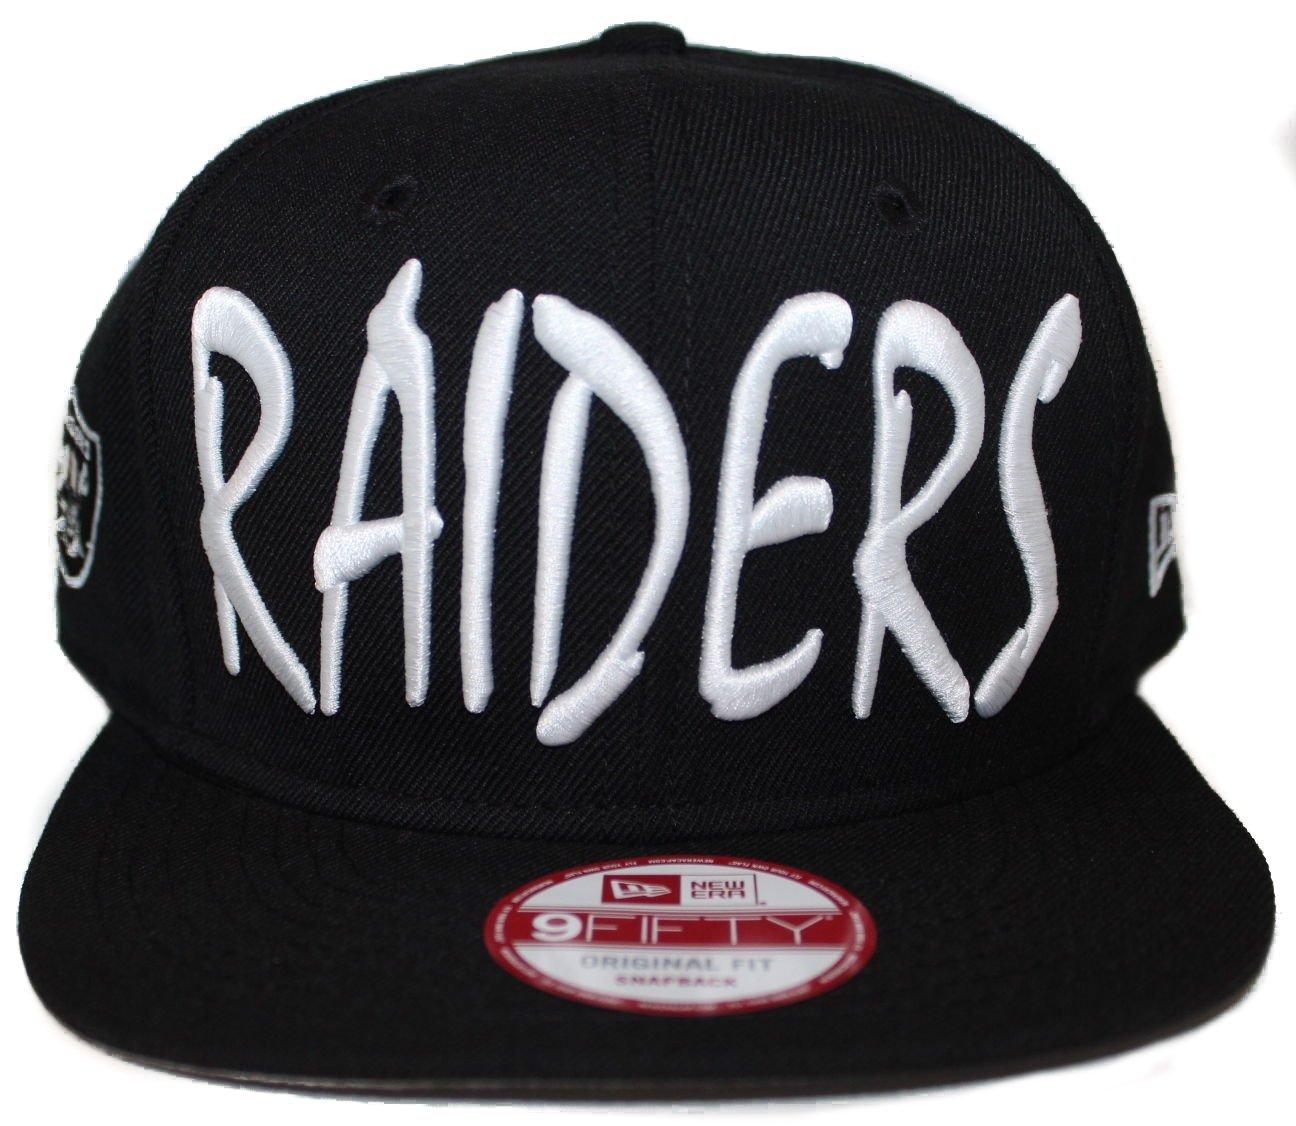 dbd1a268bde1c New Era Los Angeles Raiders 9Fifty Black and White Sketch Script N.W.A  Adjustable Snapback Hat NFL